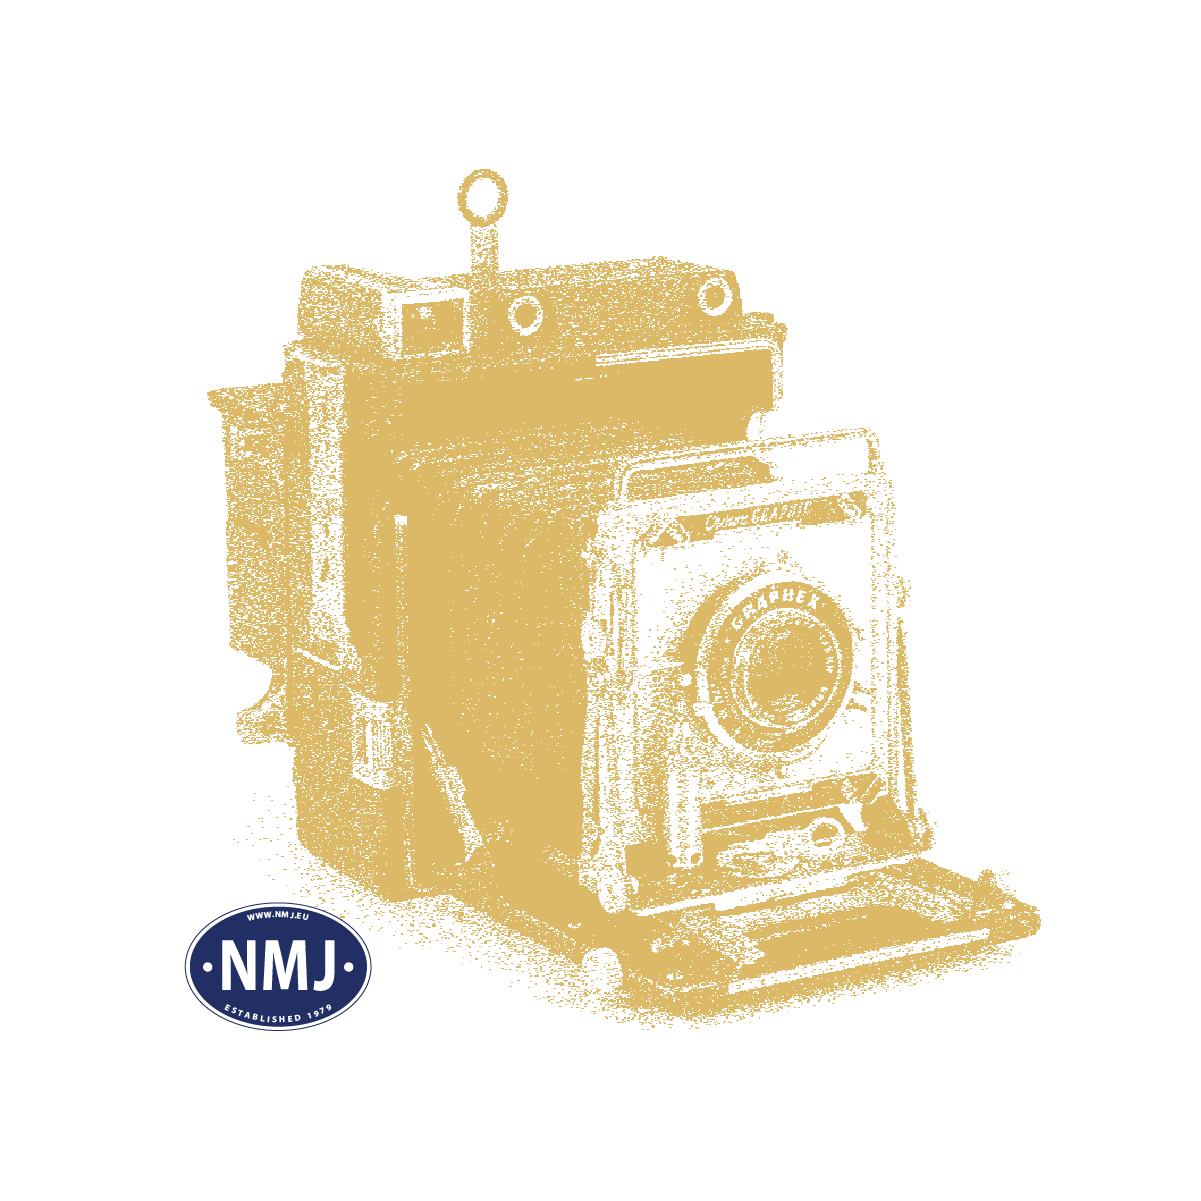 "NMJT90211 - NMJ Topline MAV M61 019 ""Nostalgia"", DC"